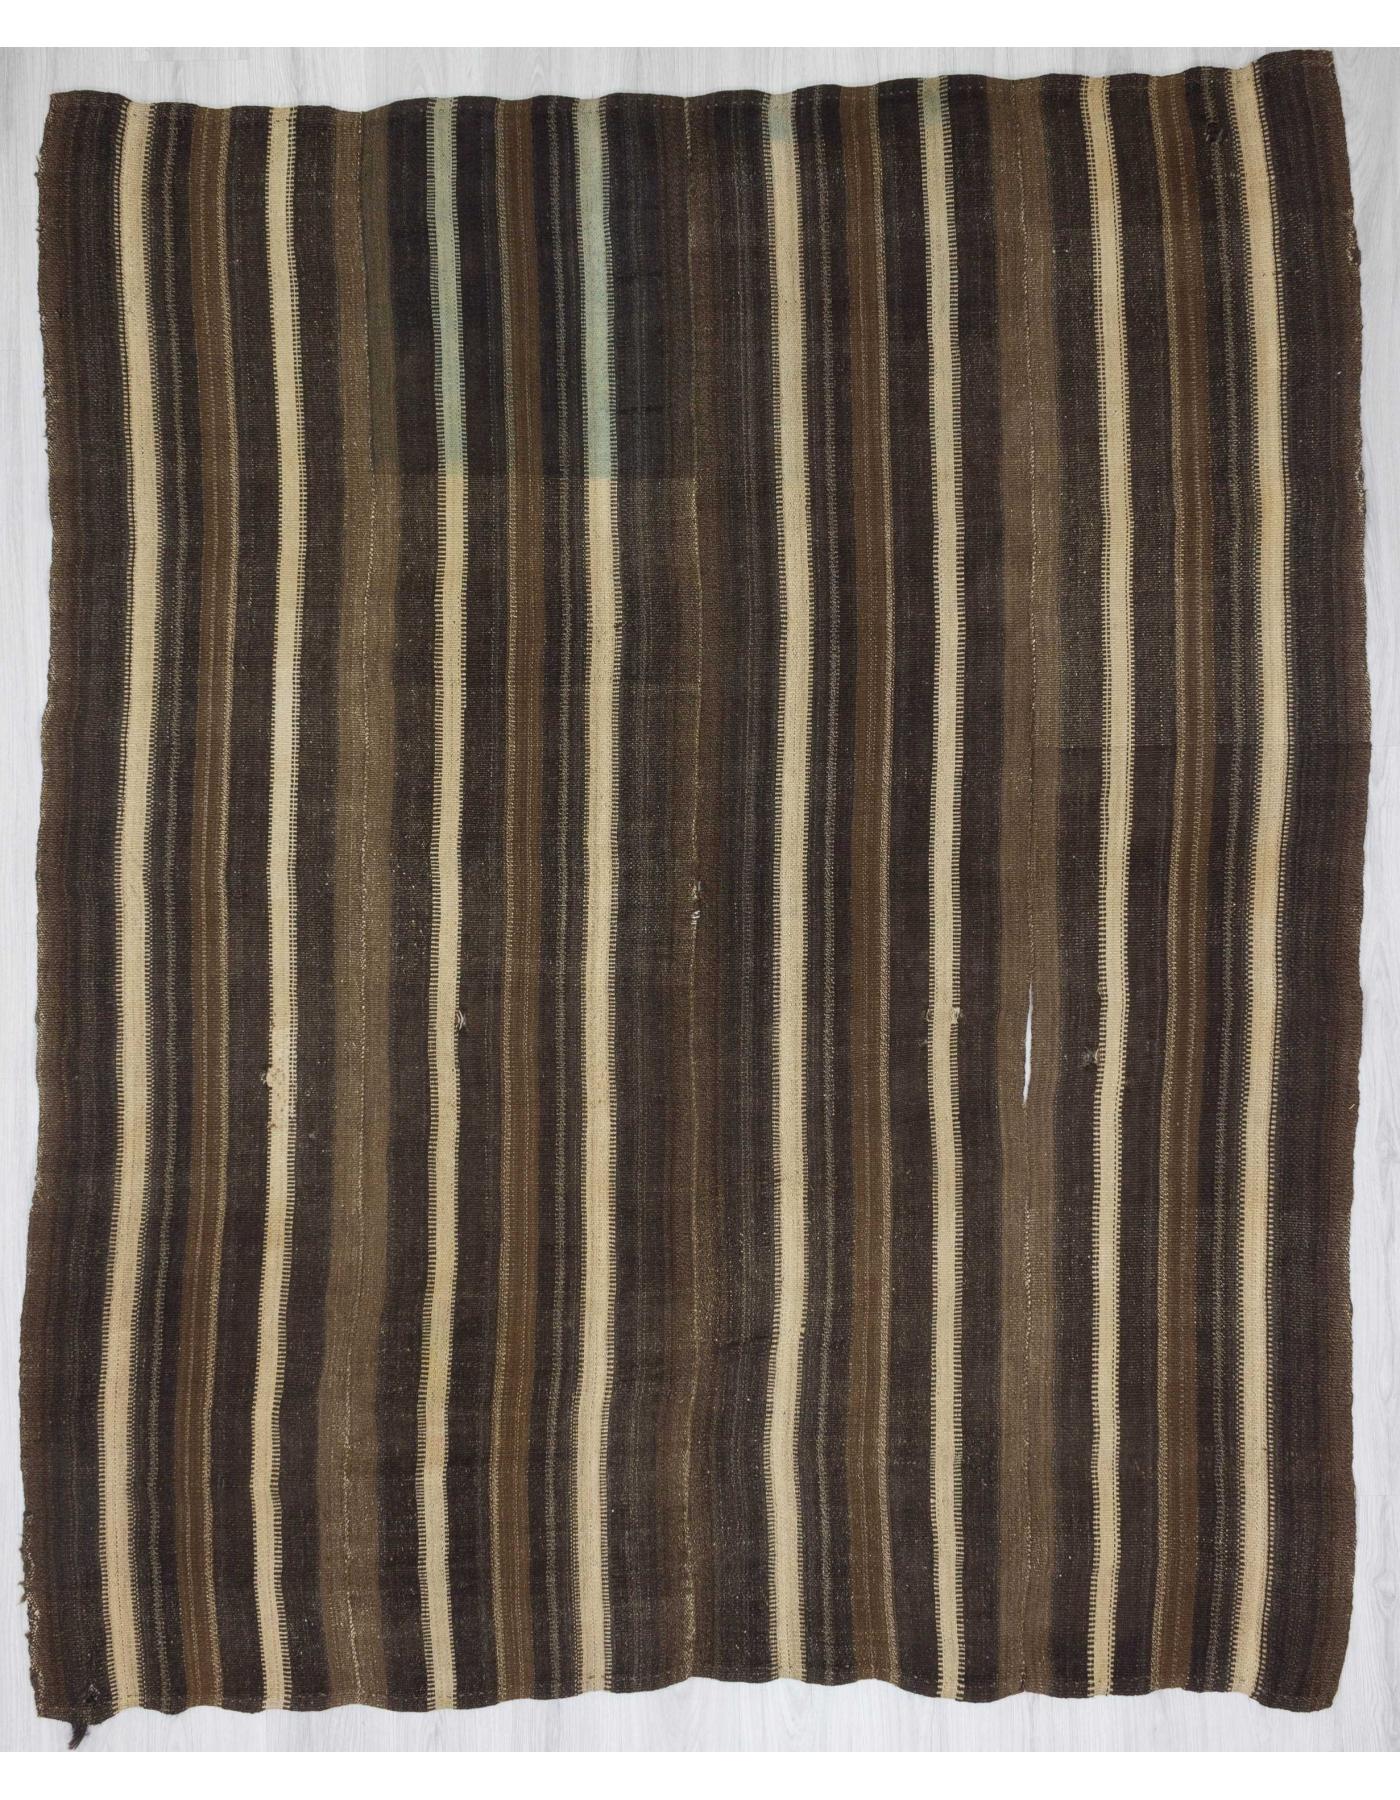 White Brown Striped Vintage Turkish Kilim Rug